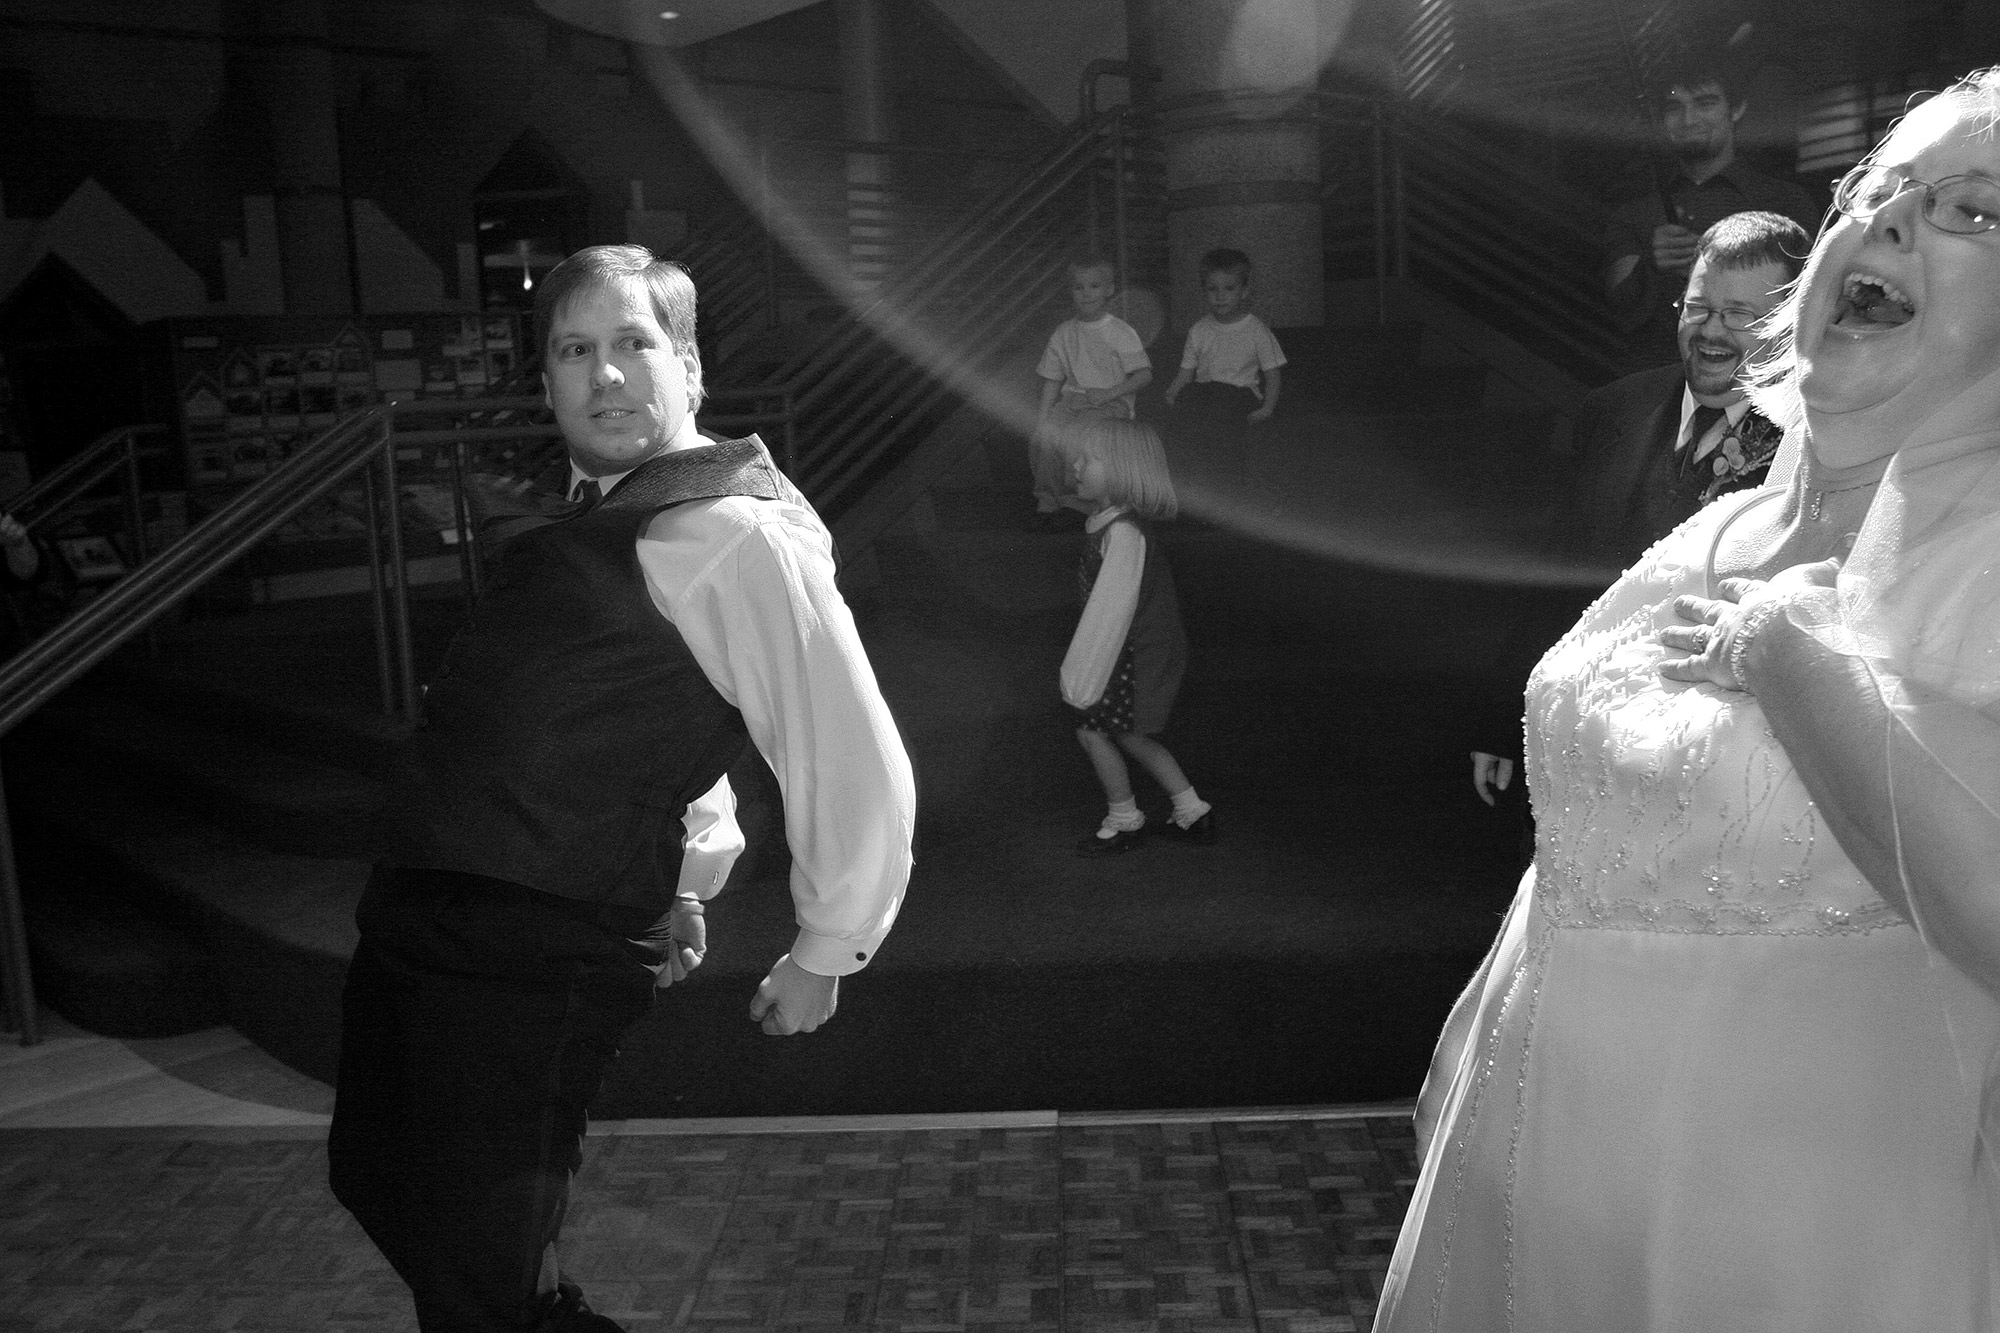 wedding-photography-saint-paul-mark-kegans-665.jpg